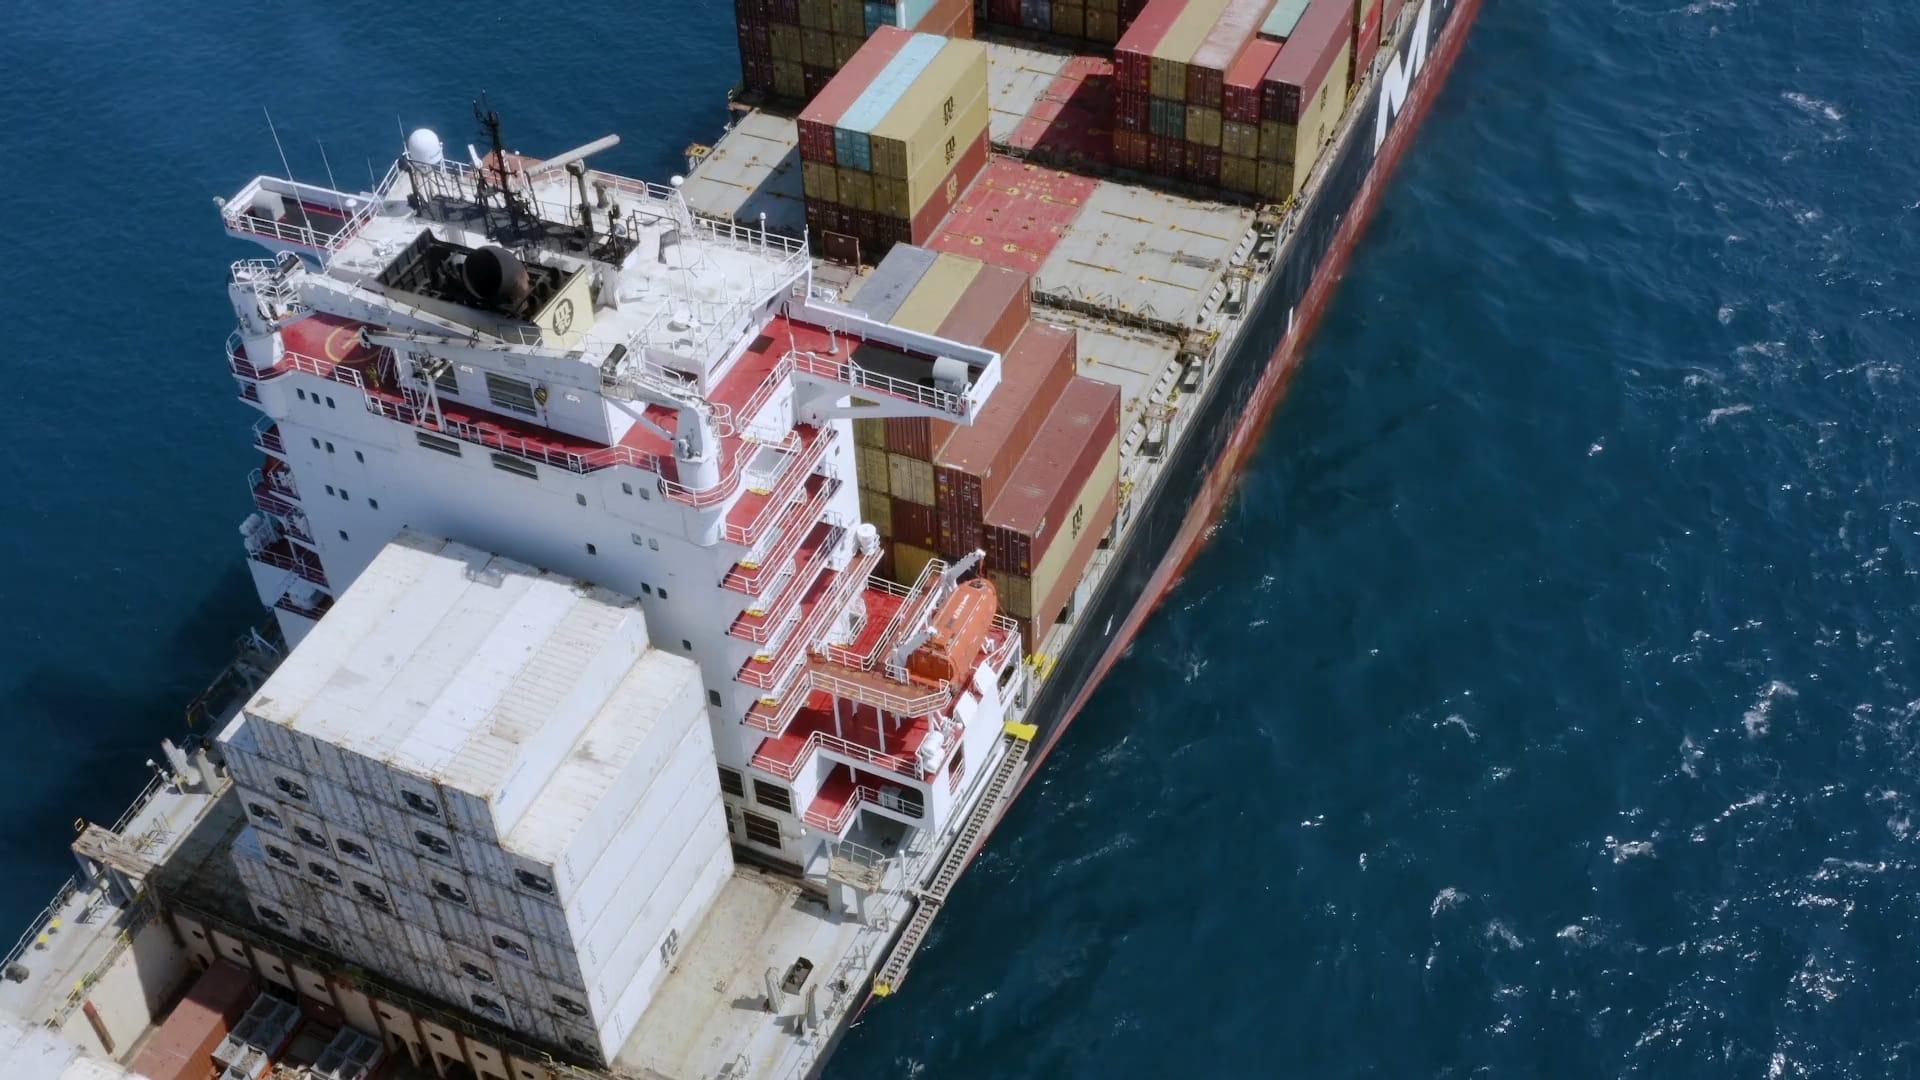 Freight ship on sea